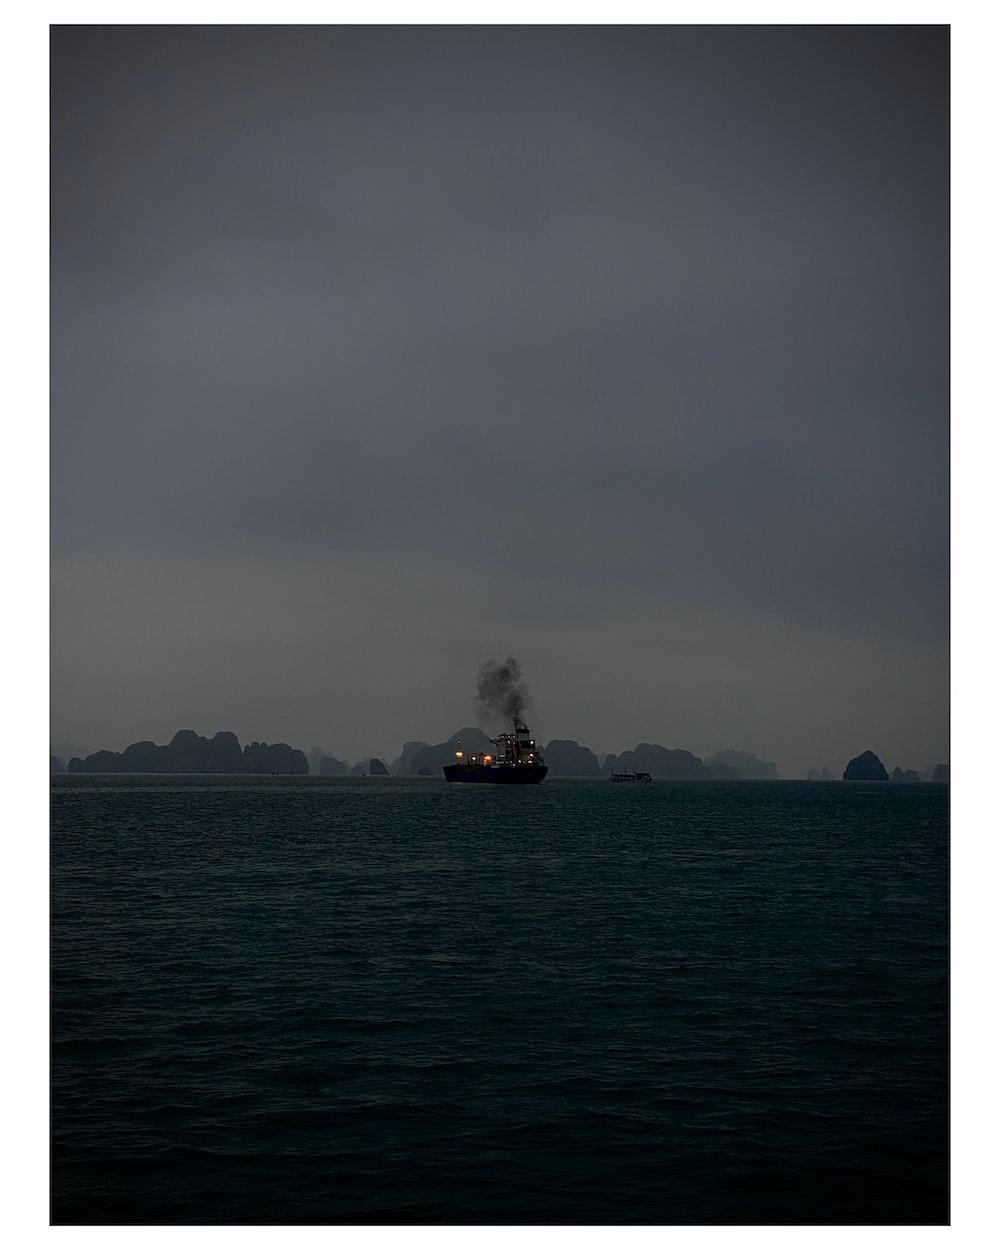 ship in sea under gray sky